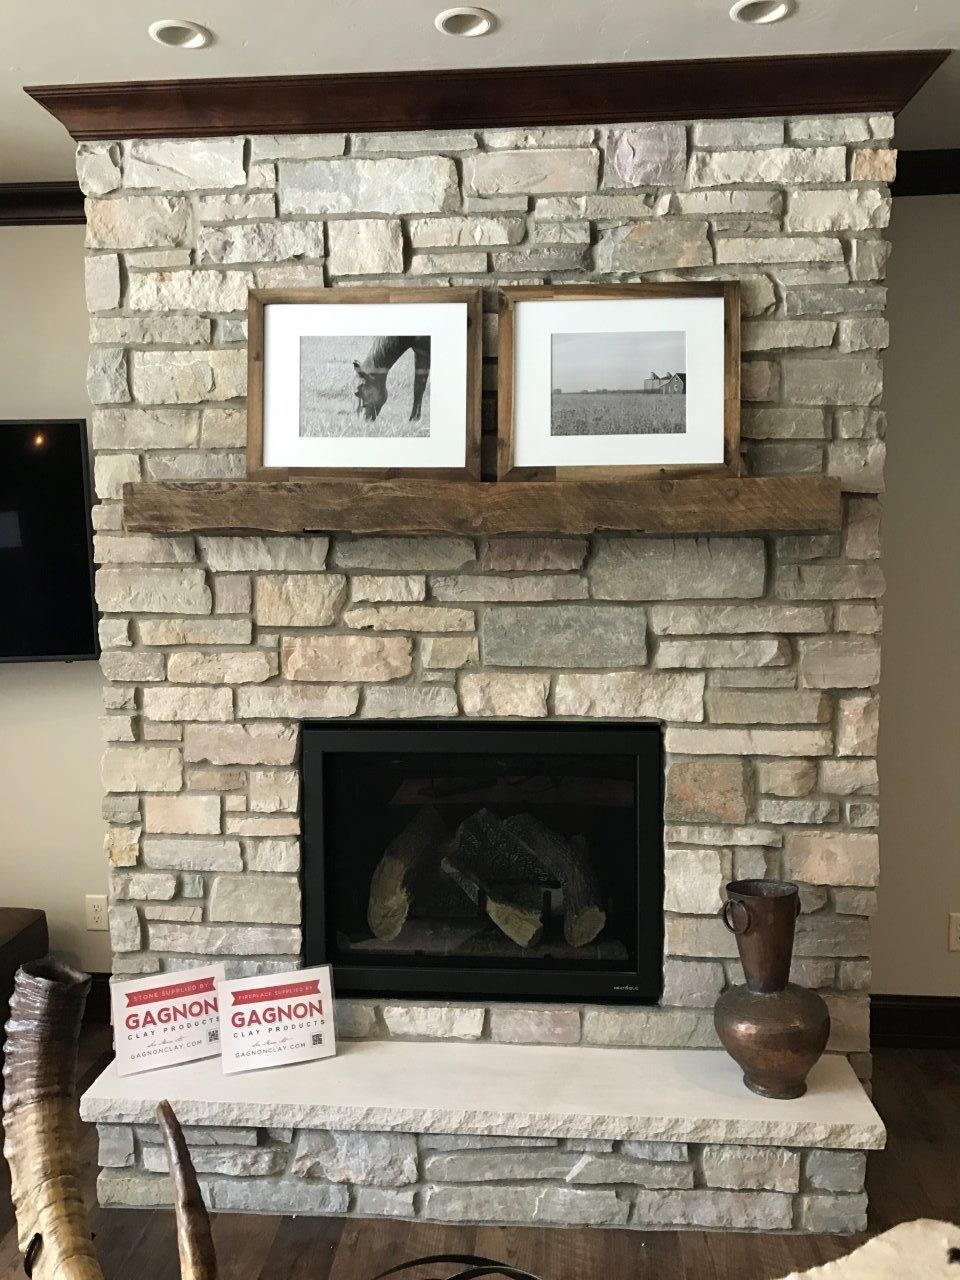 Halquist Chilton Ledgestone  Fireplace  Gagnon Clay Products